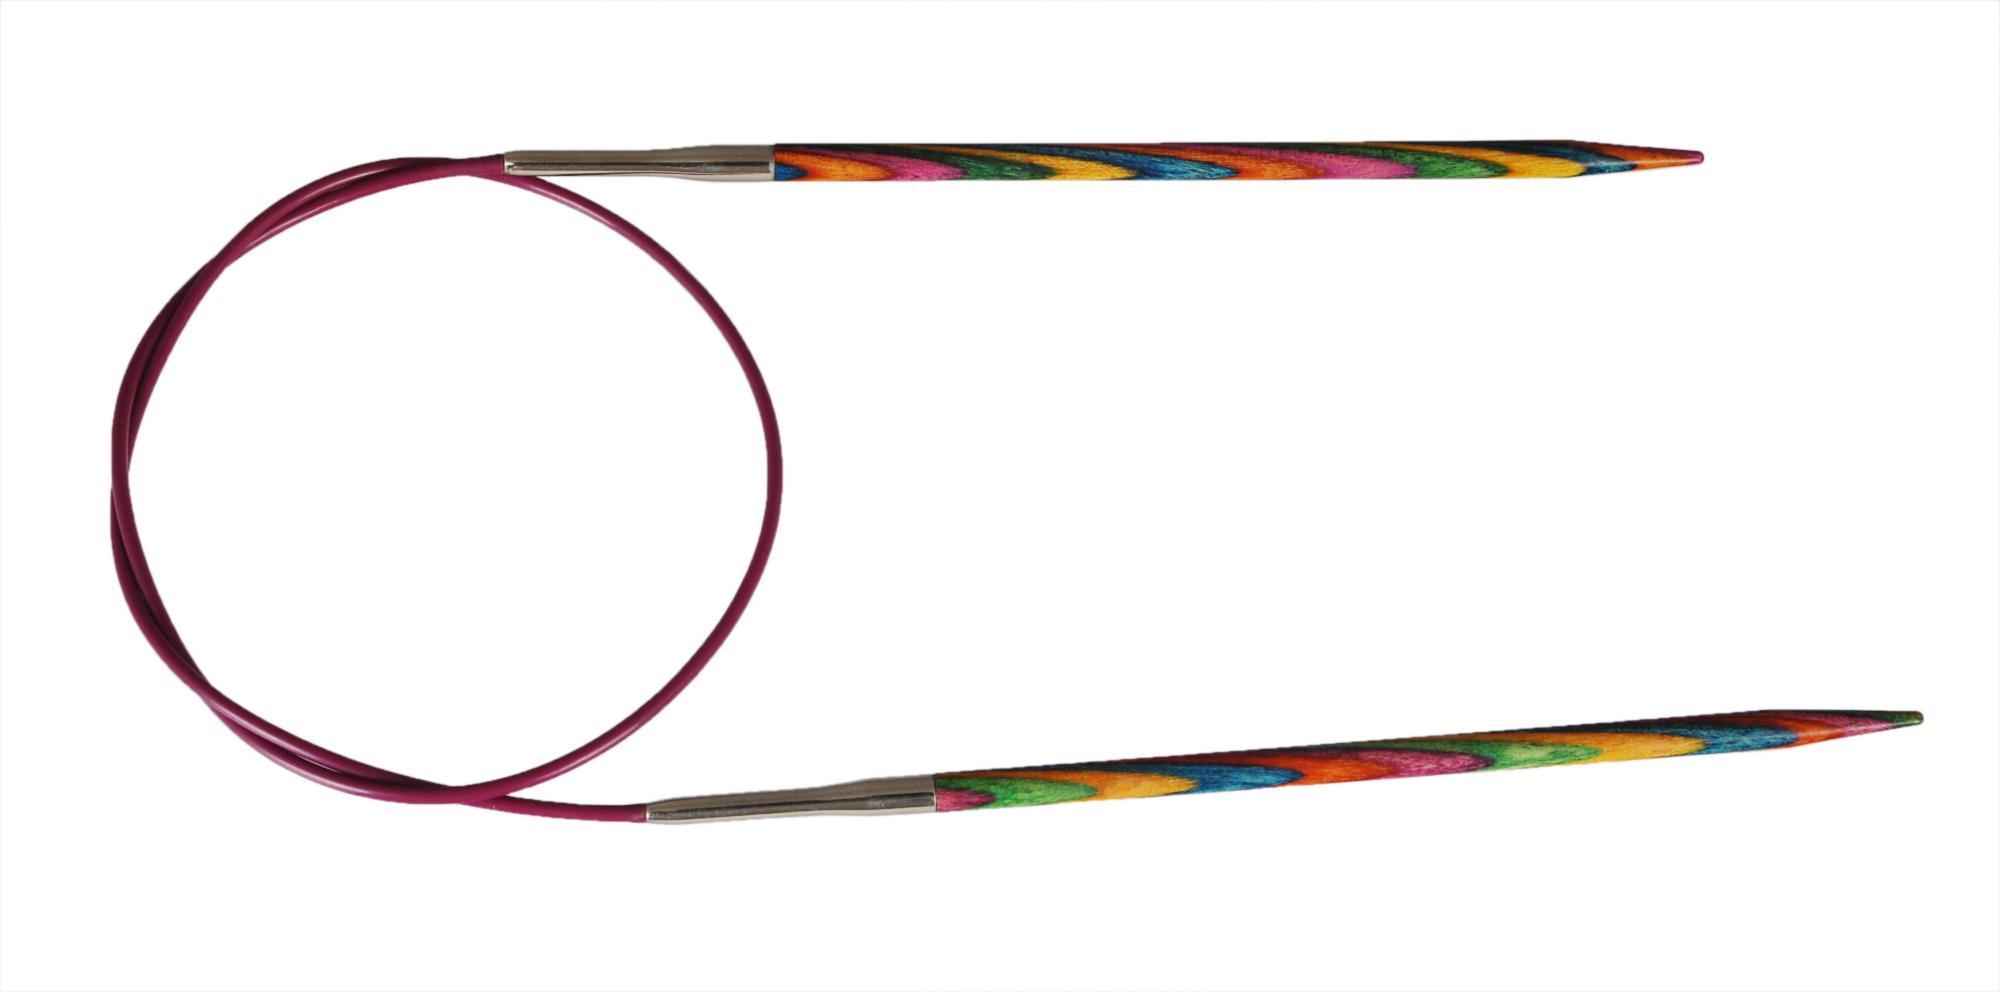 Спицы круговые 50 см Symfonie Wood KnitPro, 20381, 2.00 мм